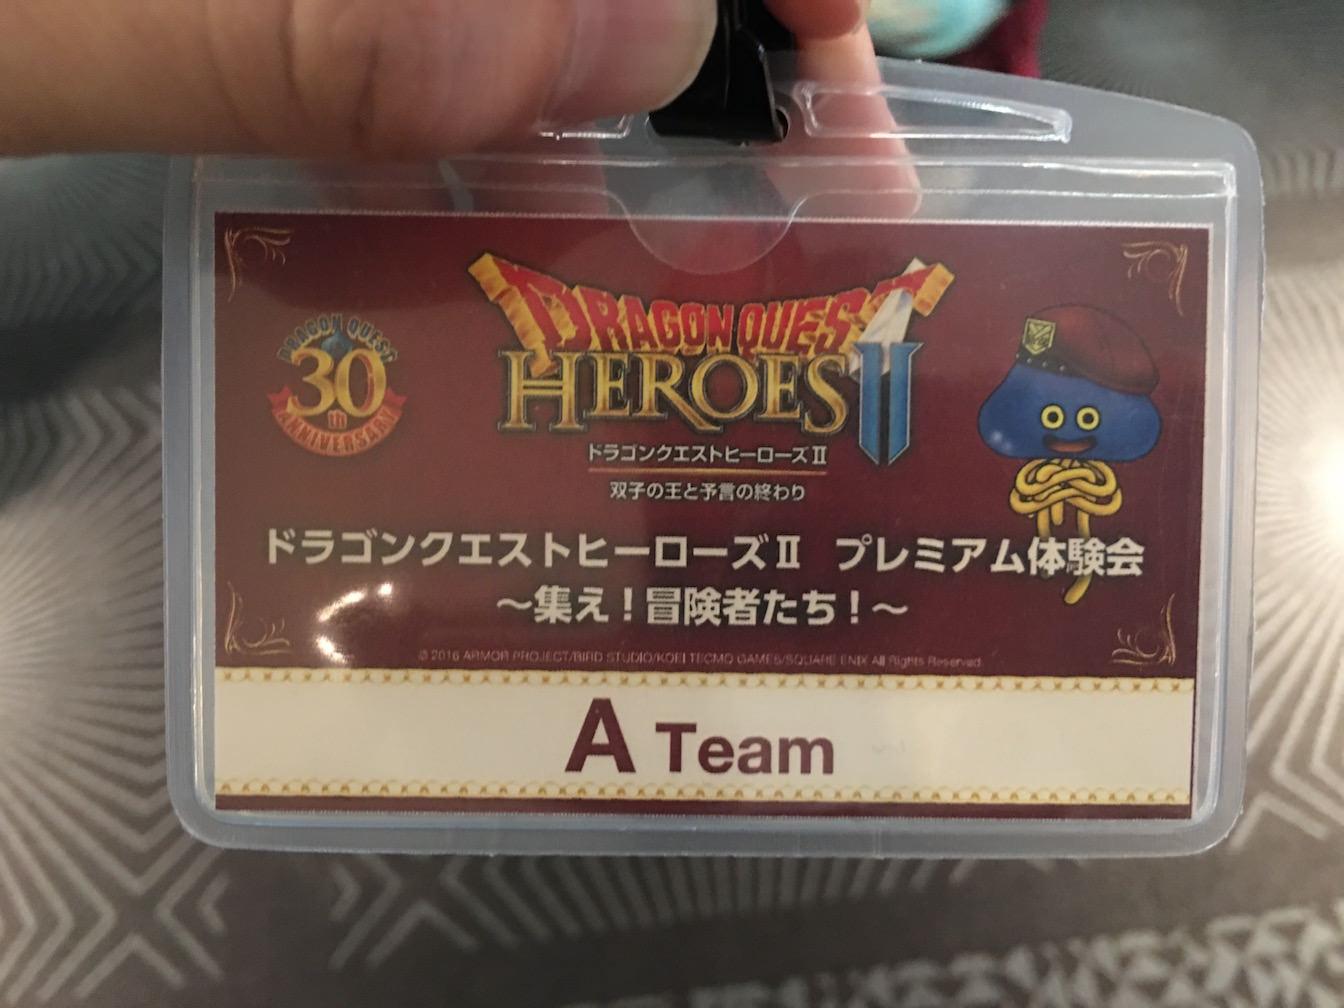 Dragon quest heros 2 premium experience meeting report 15